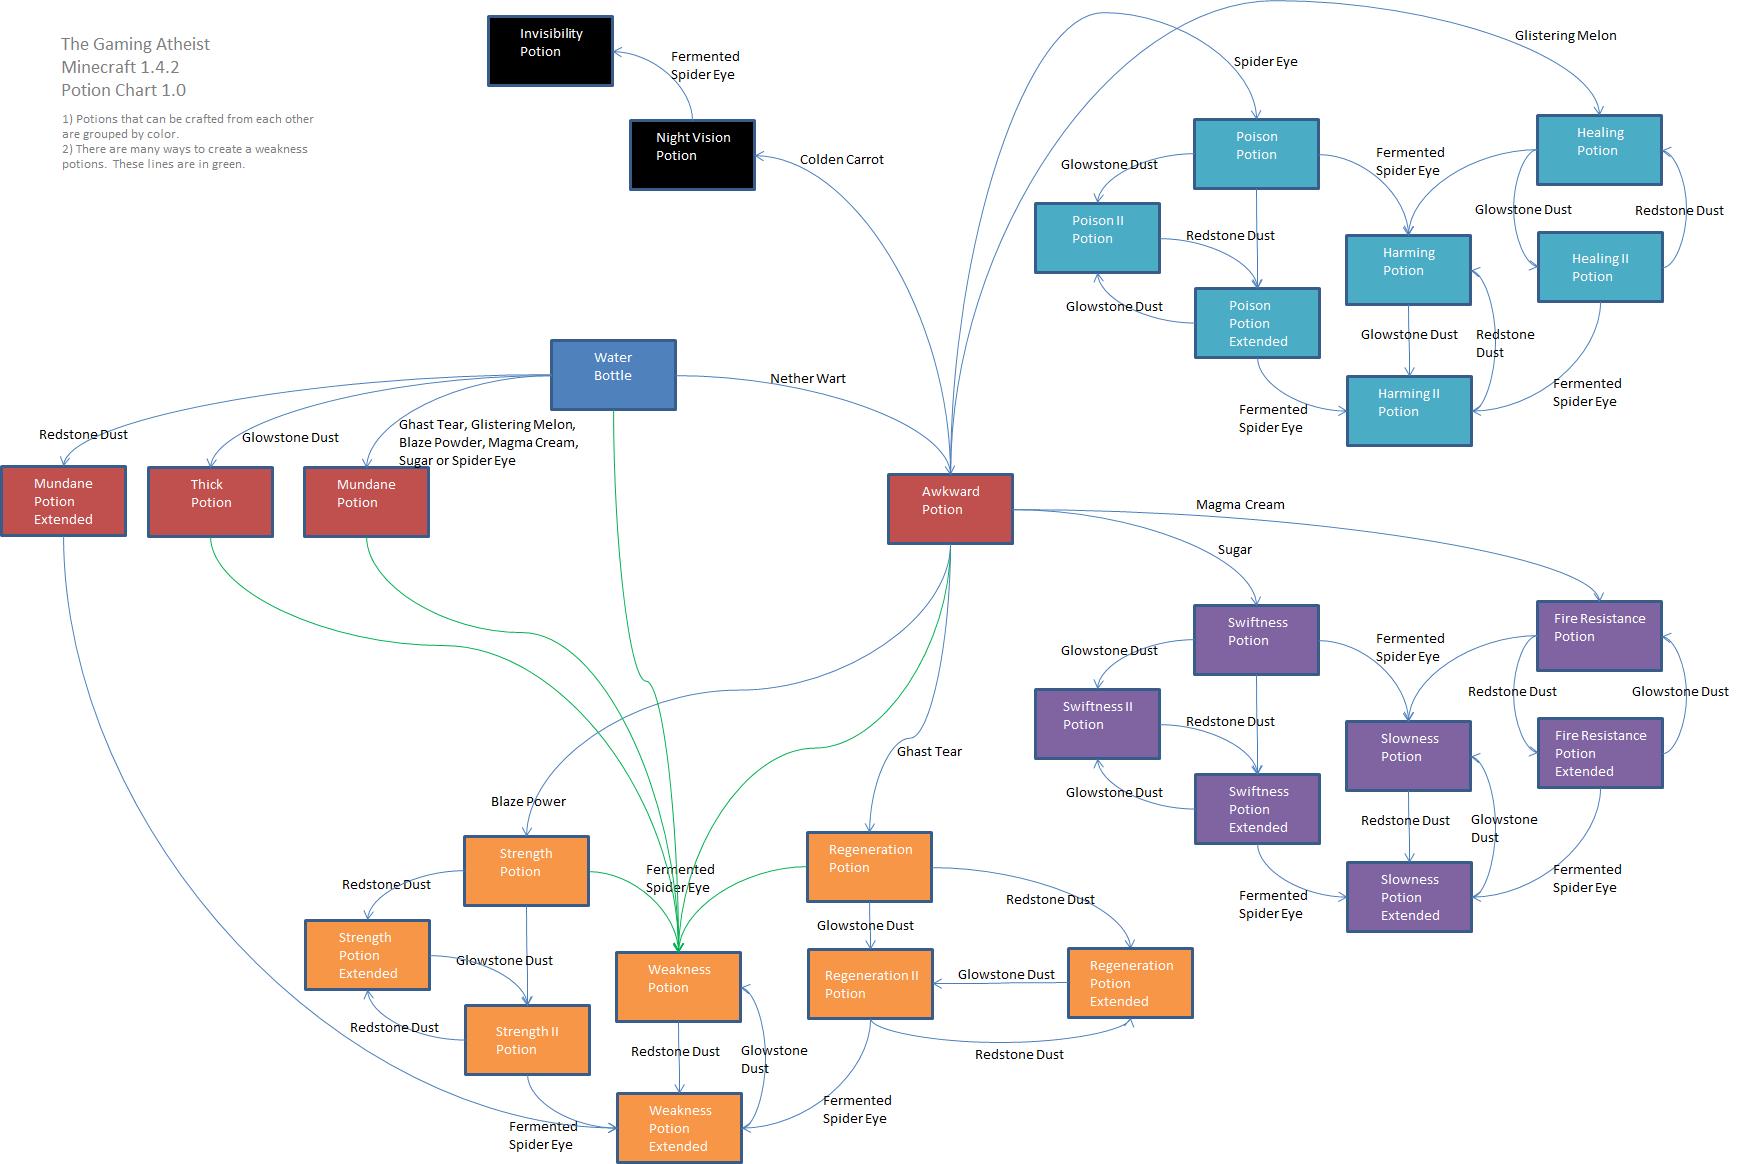 hight resolution of minecraft potion diagram for 1 4 2 v1 0 the gaming atheist diagram minecraft diagram this minecraft